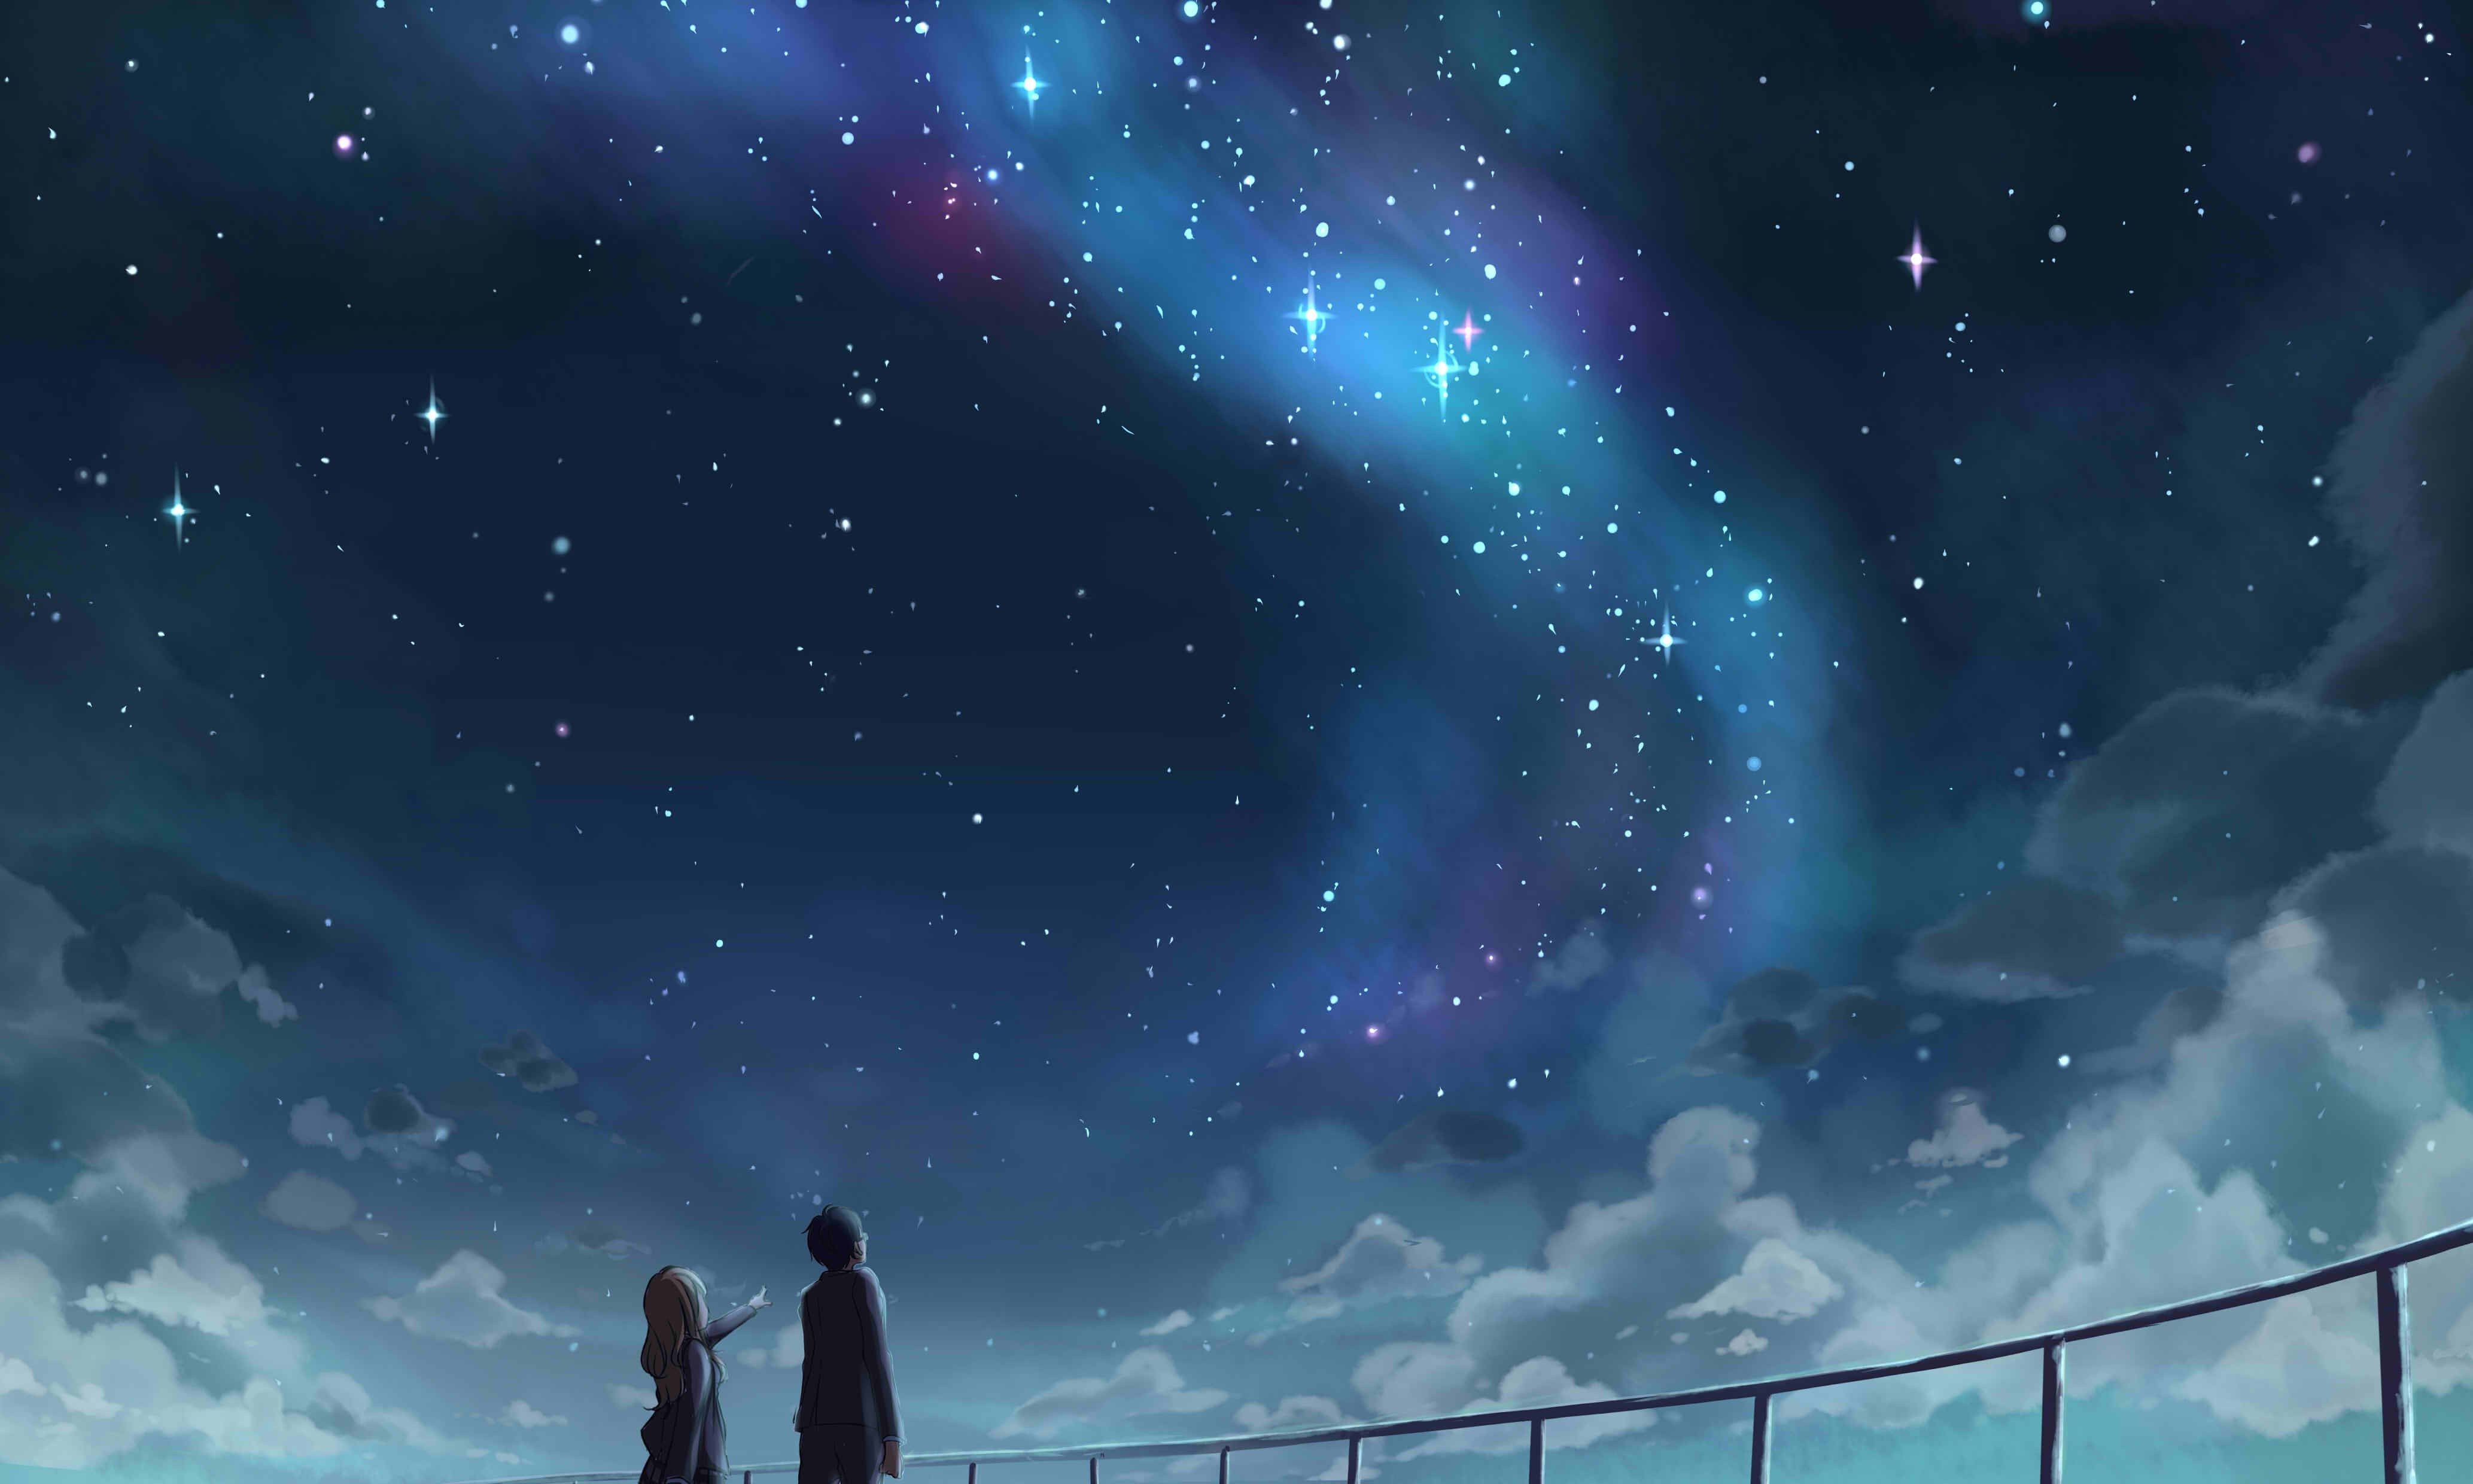 4133x2480 Your Lie In April 4k Wallpaper 4133x2480 Wallpaper Anime And Otaku Your Lie In April Sky Anime Anime Galaxy